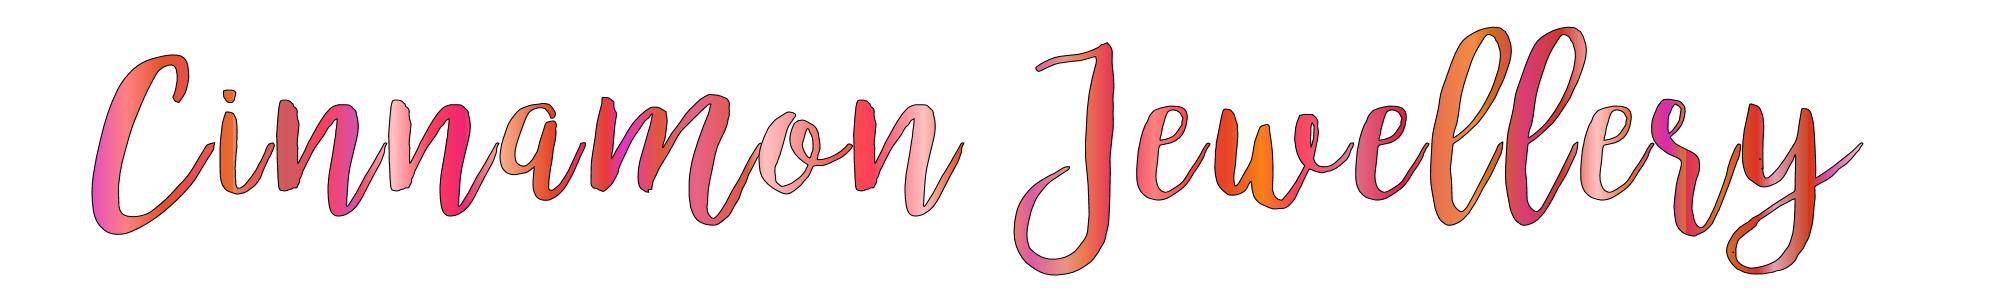 cinnamon jewellery logo